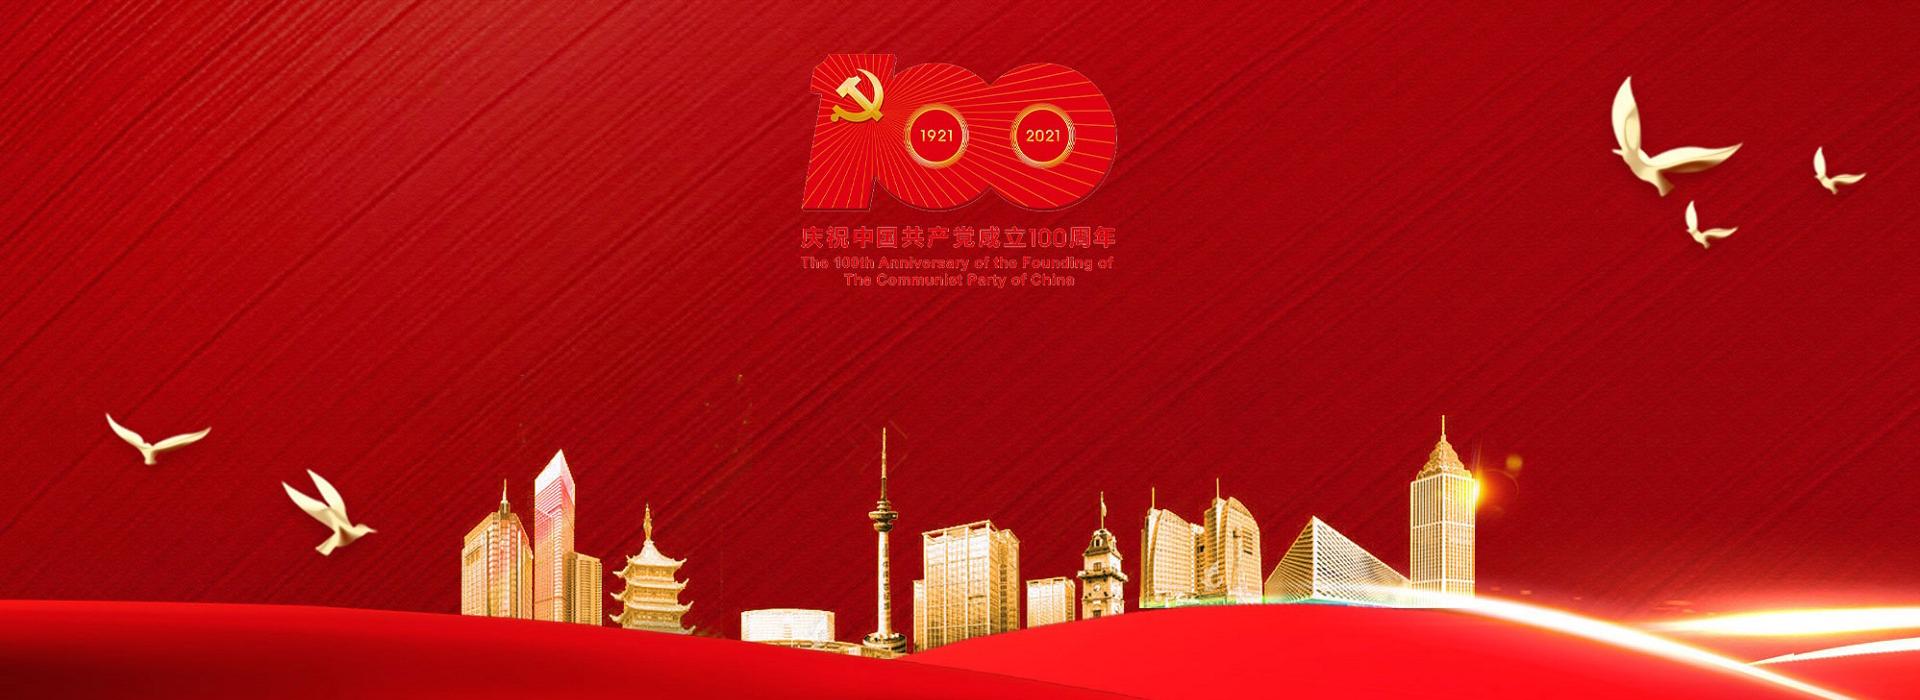 Celebrate CPC's centenary in Nantong's way